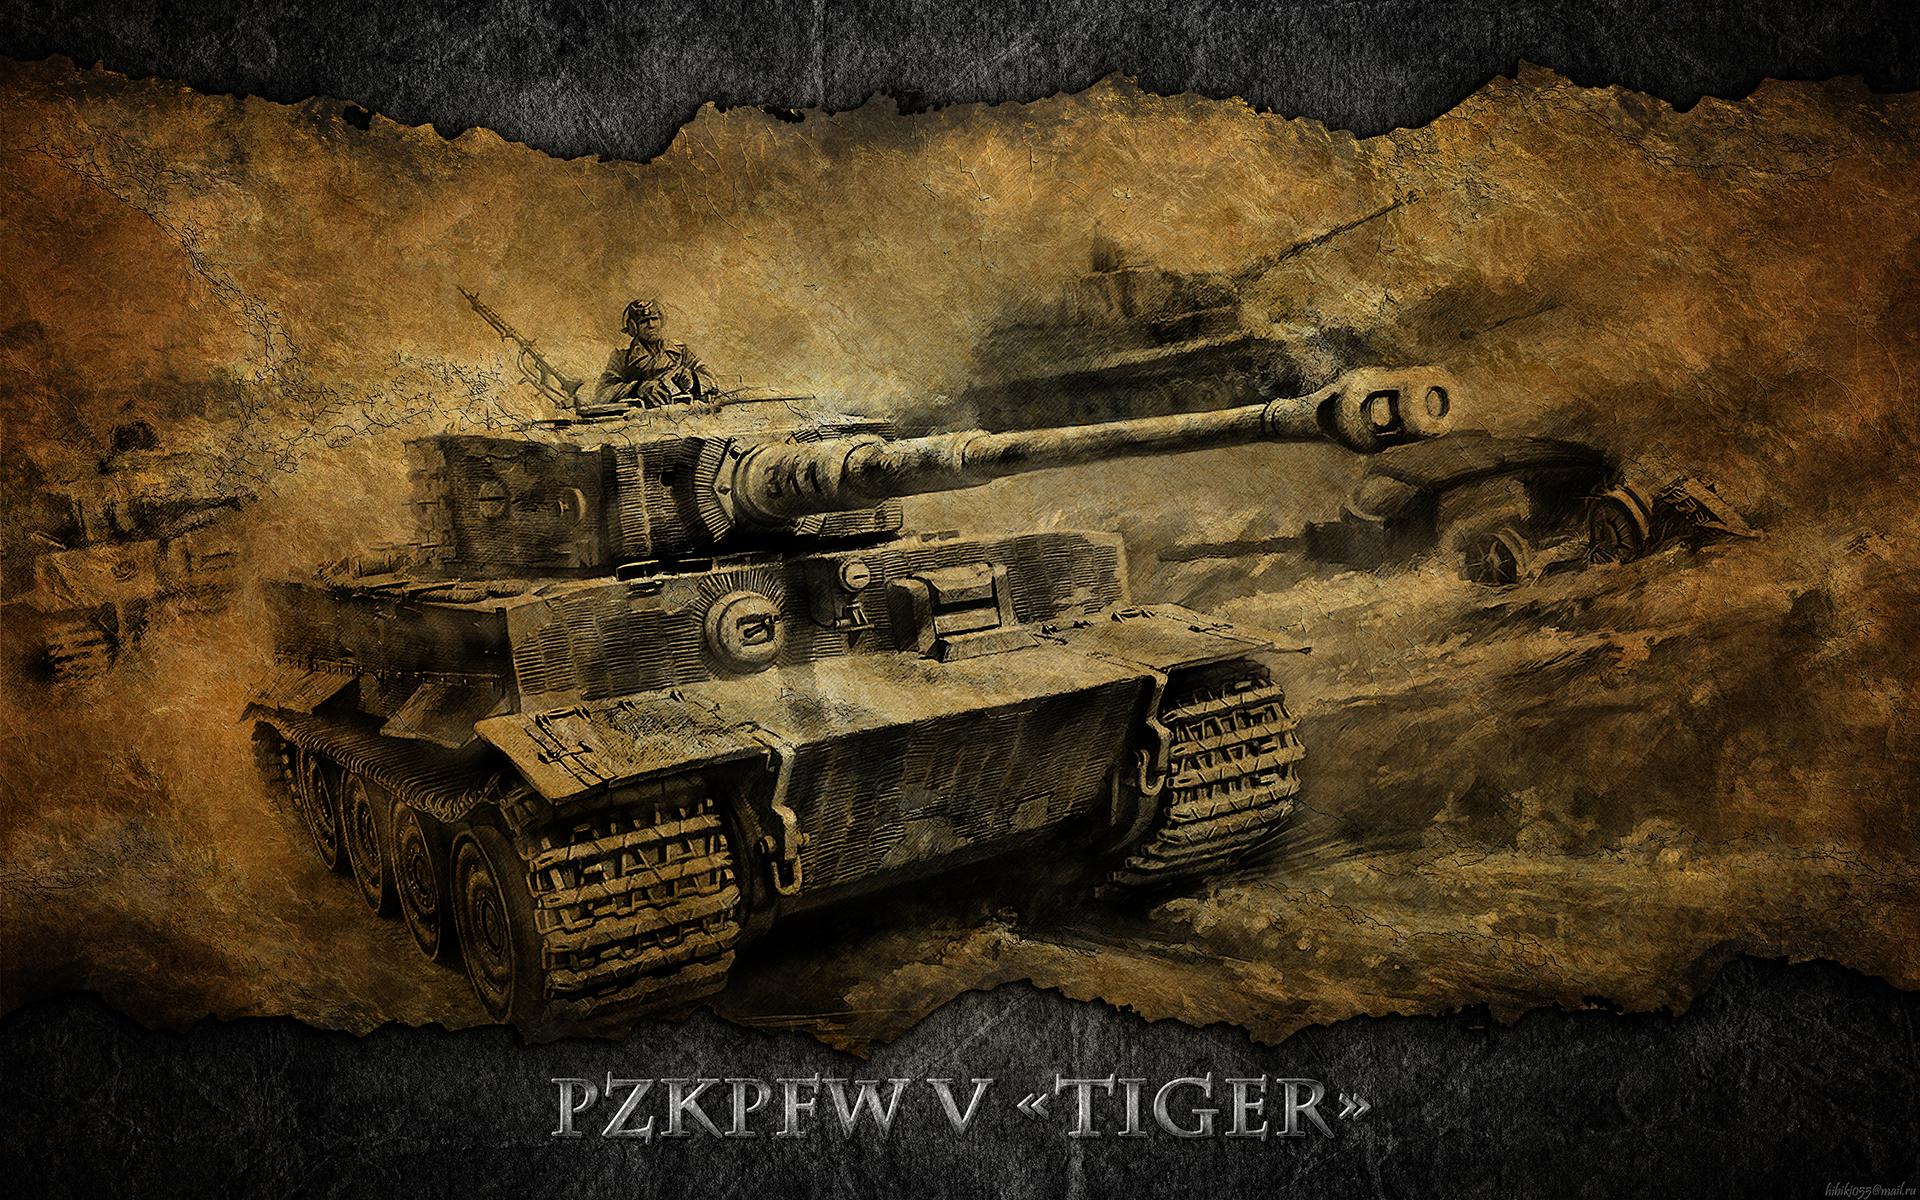 Tiger Tank Wallpaper Photos 12533 - Amazing Wallpaperz